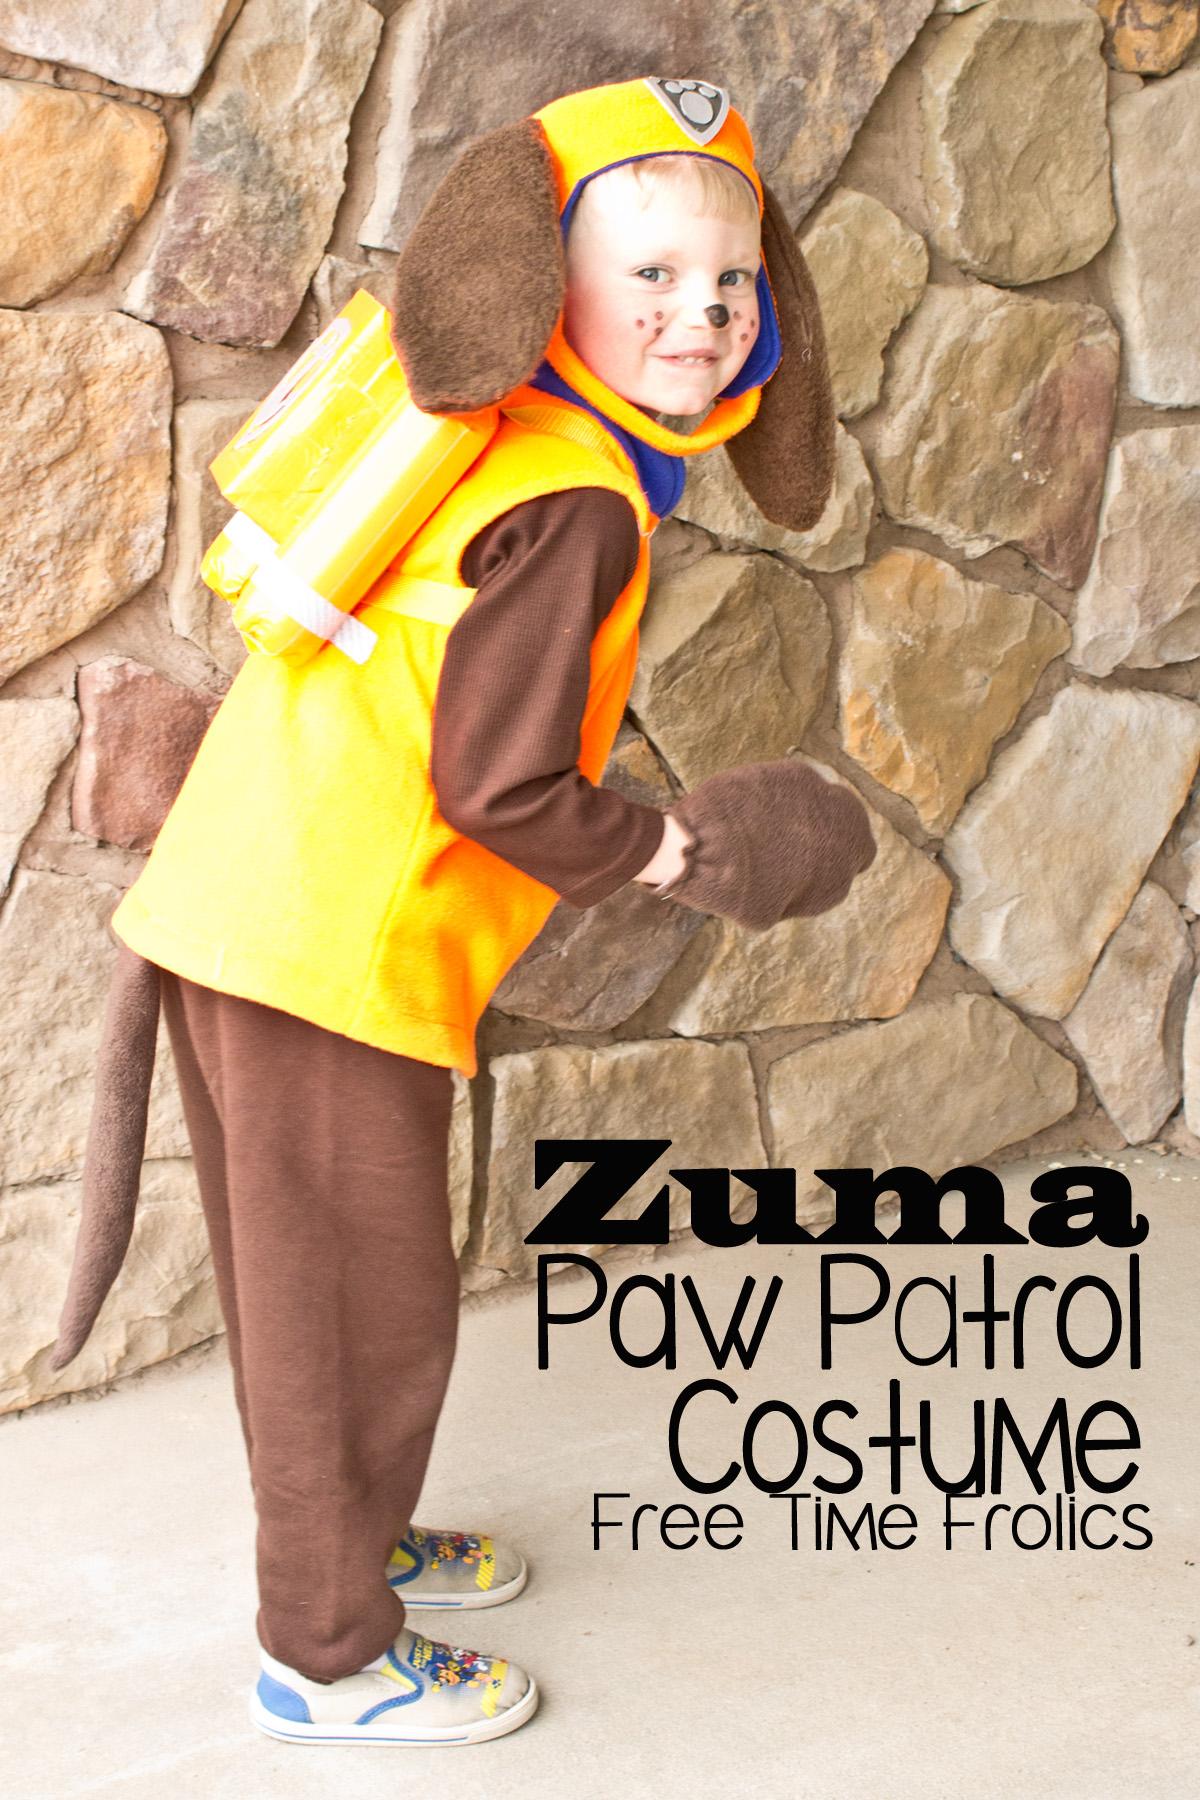 4357256d3a1d Costumi di carnevale della Paw Patrol fai da te_Zuma